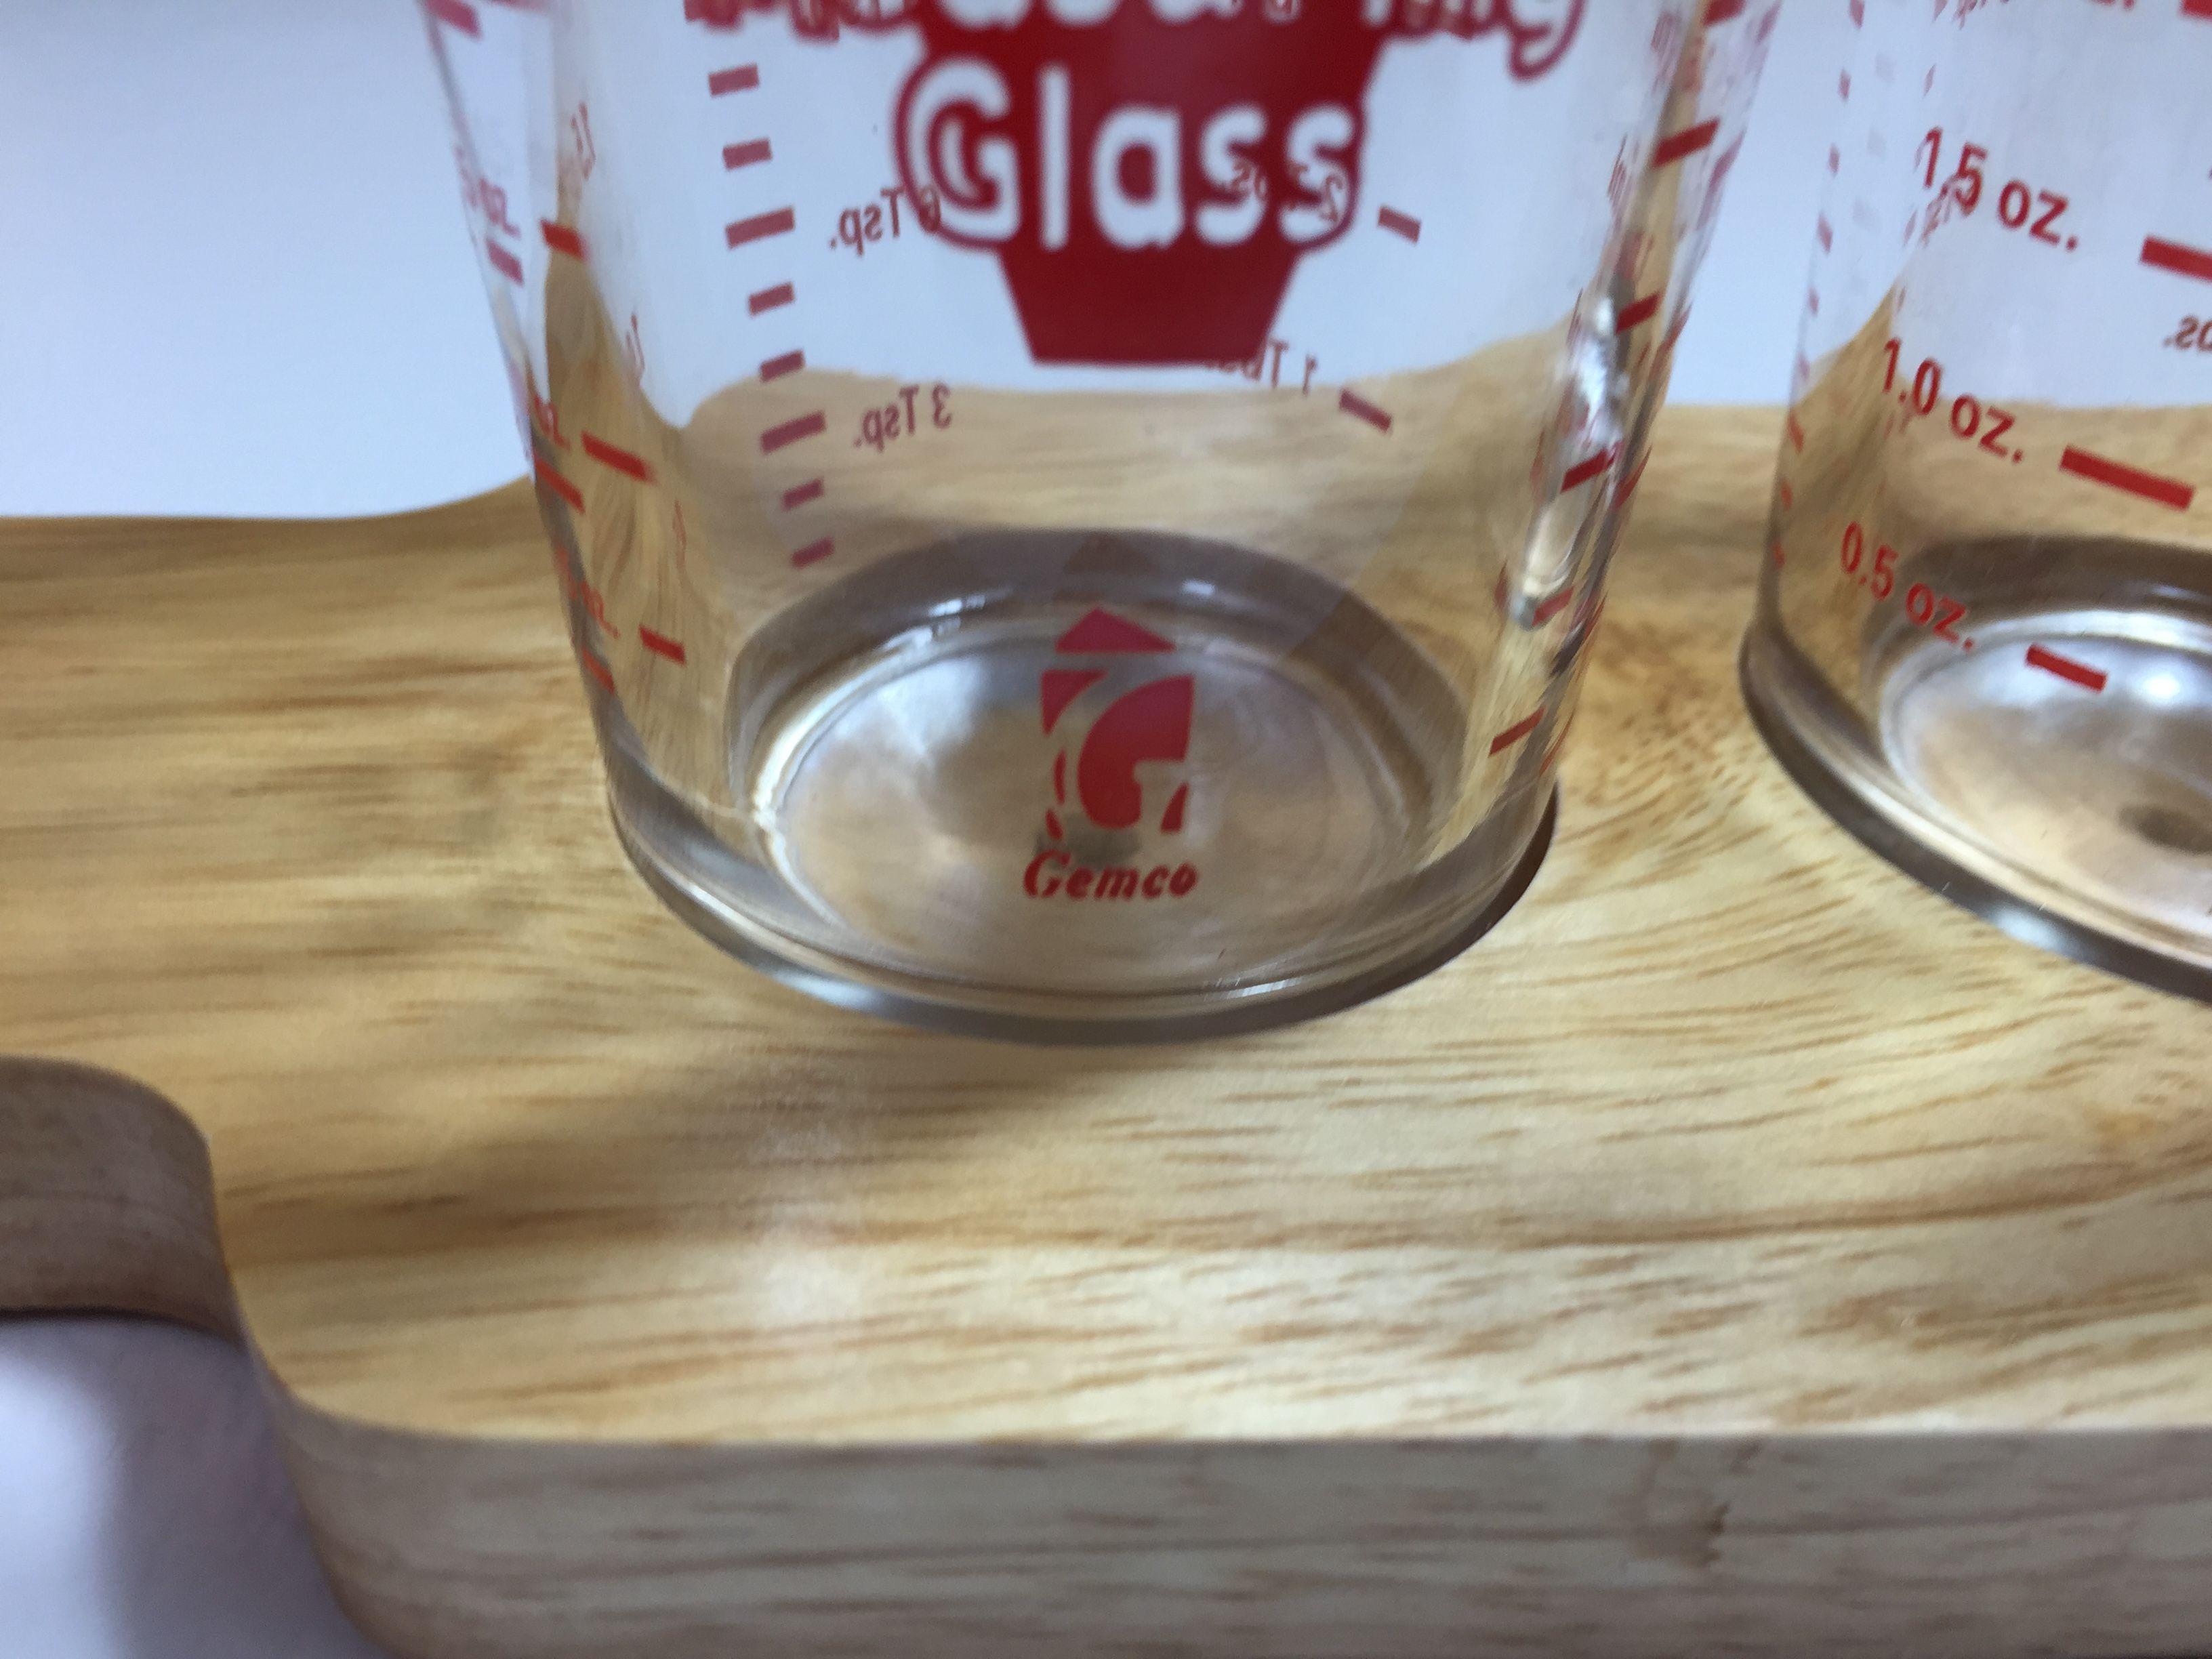 Gemco Measuring Glass